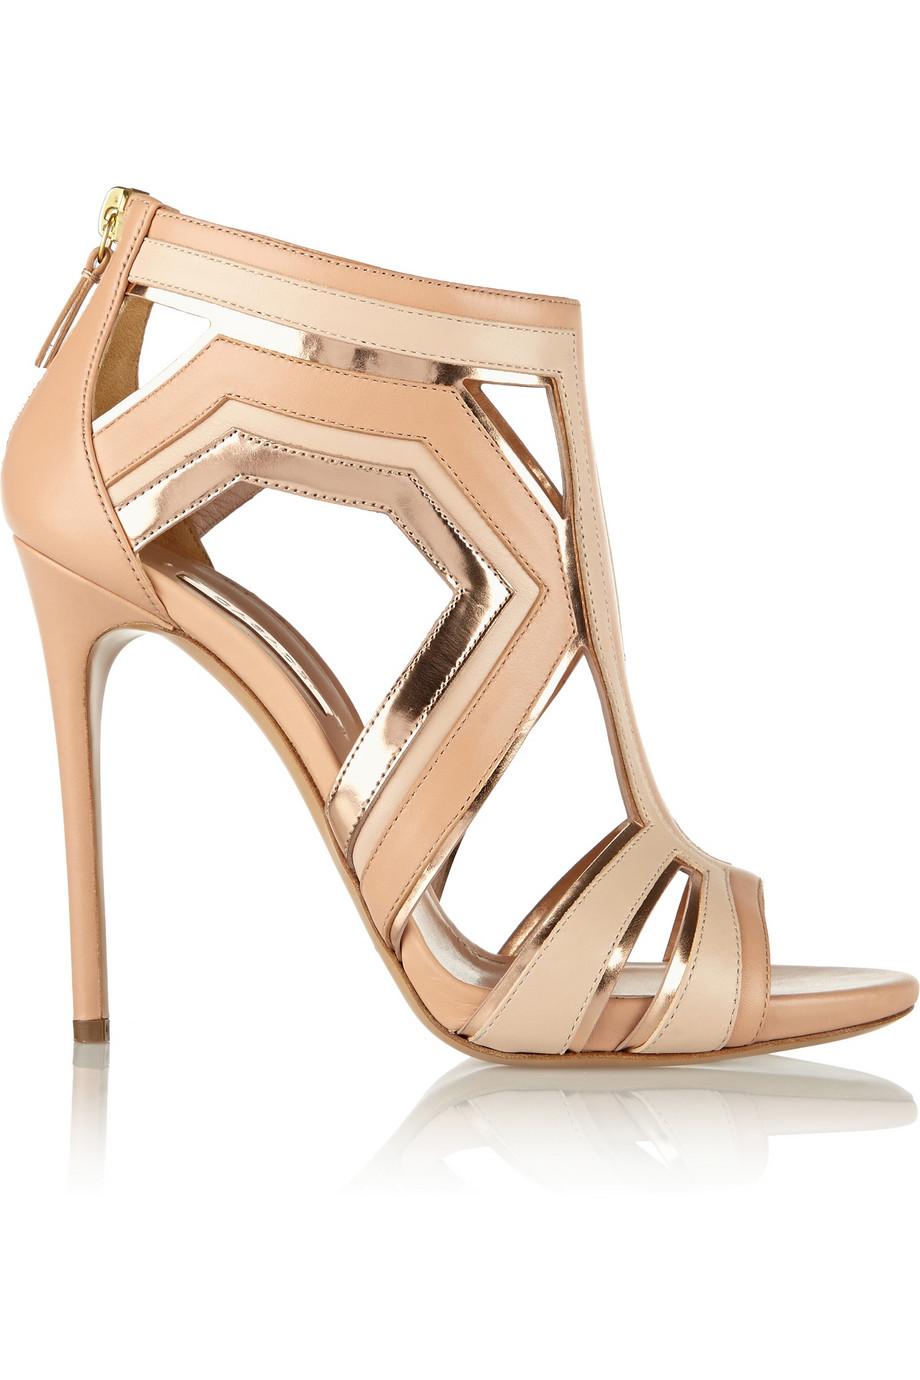 Casadei Panel Leather Sandals $480